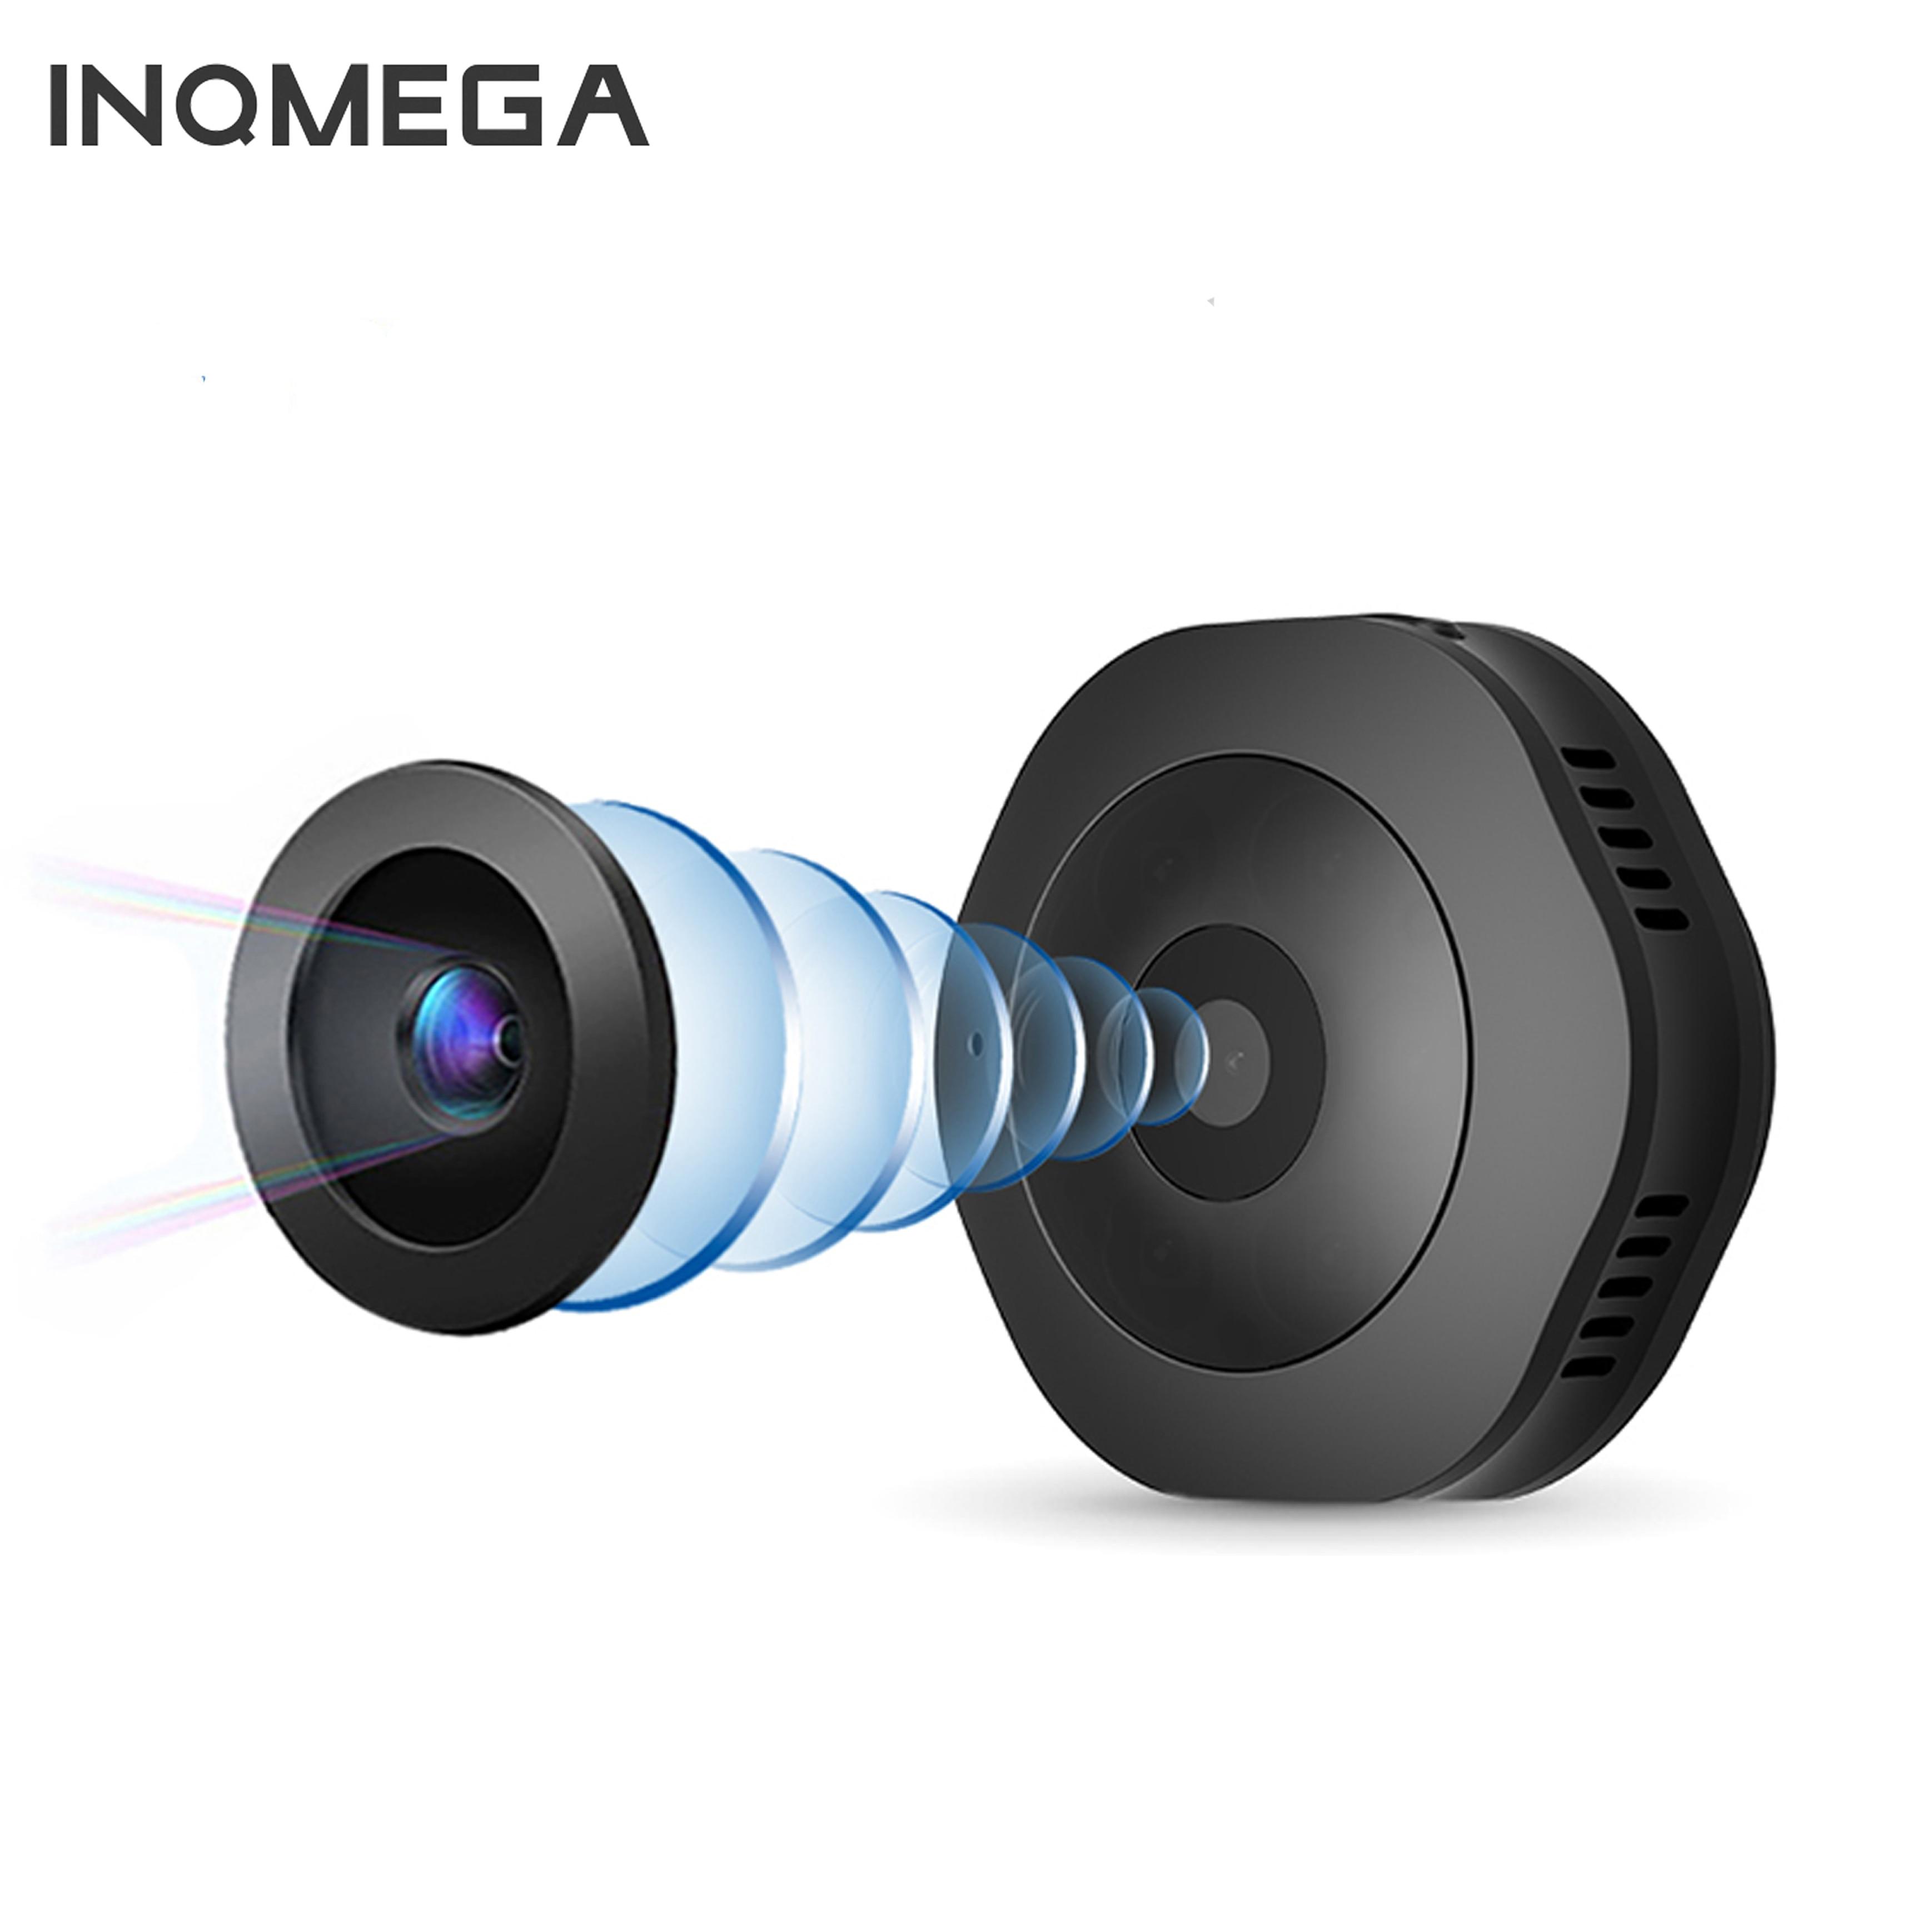 INQME Mini Camera Night Vision DV/Wifi Micro  Action Camera With Motion 1080P Sensor Camcorder Voice Video Recorder Small Camer